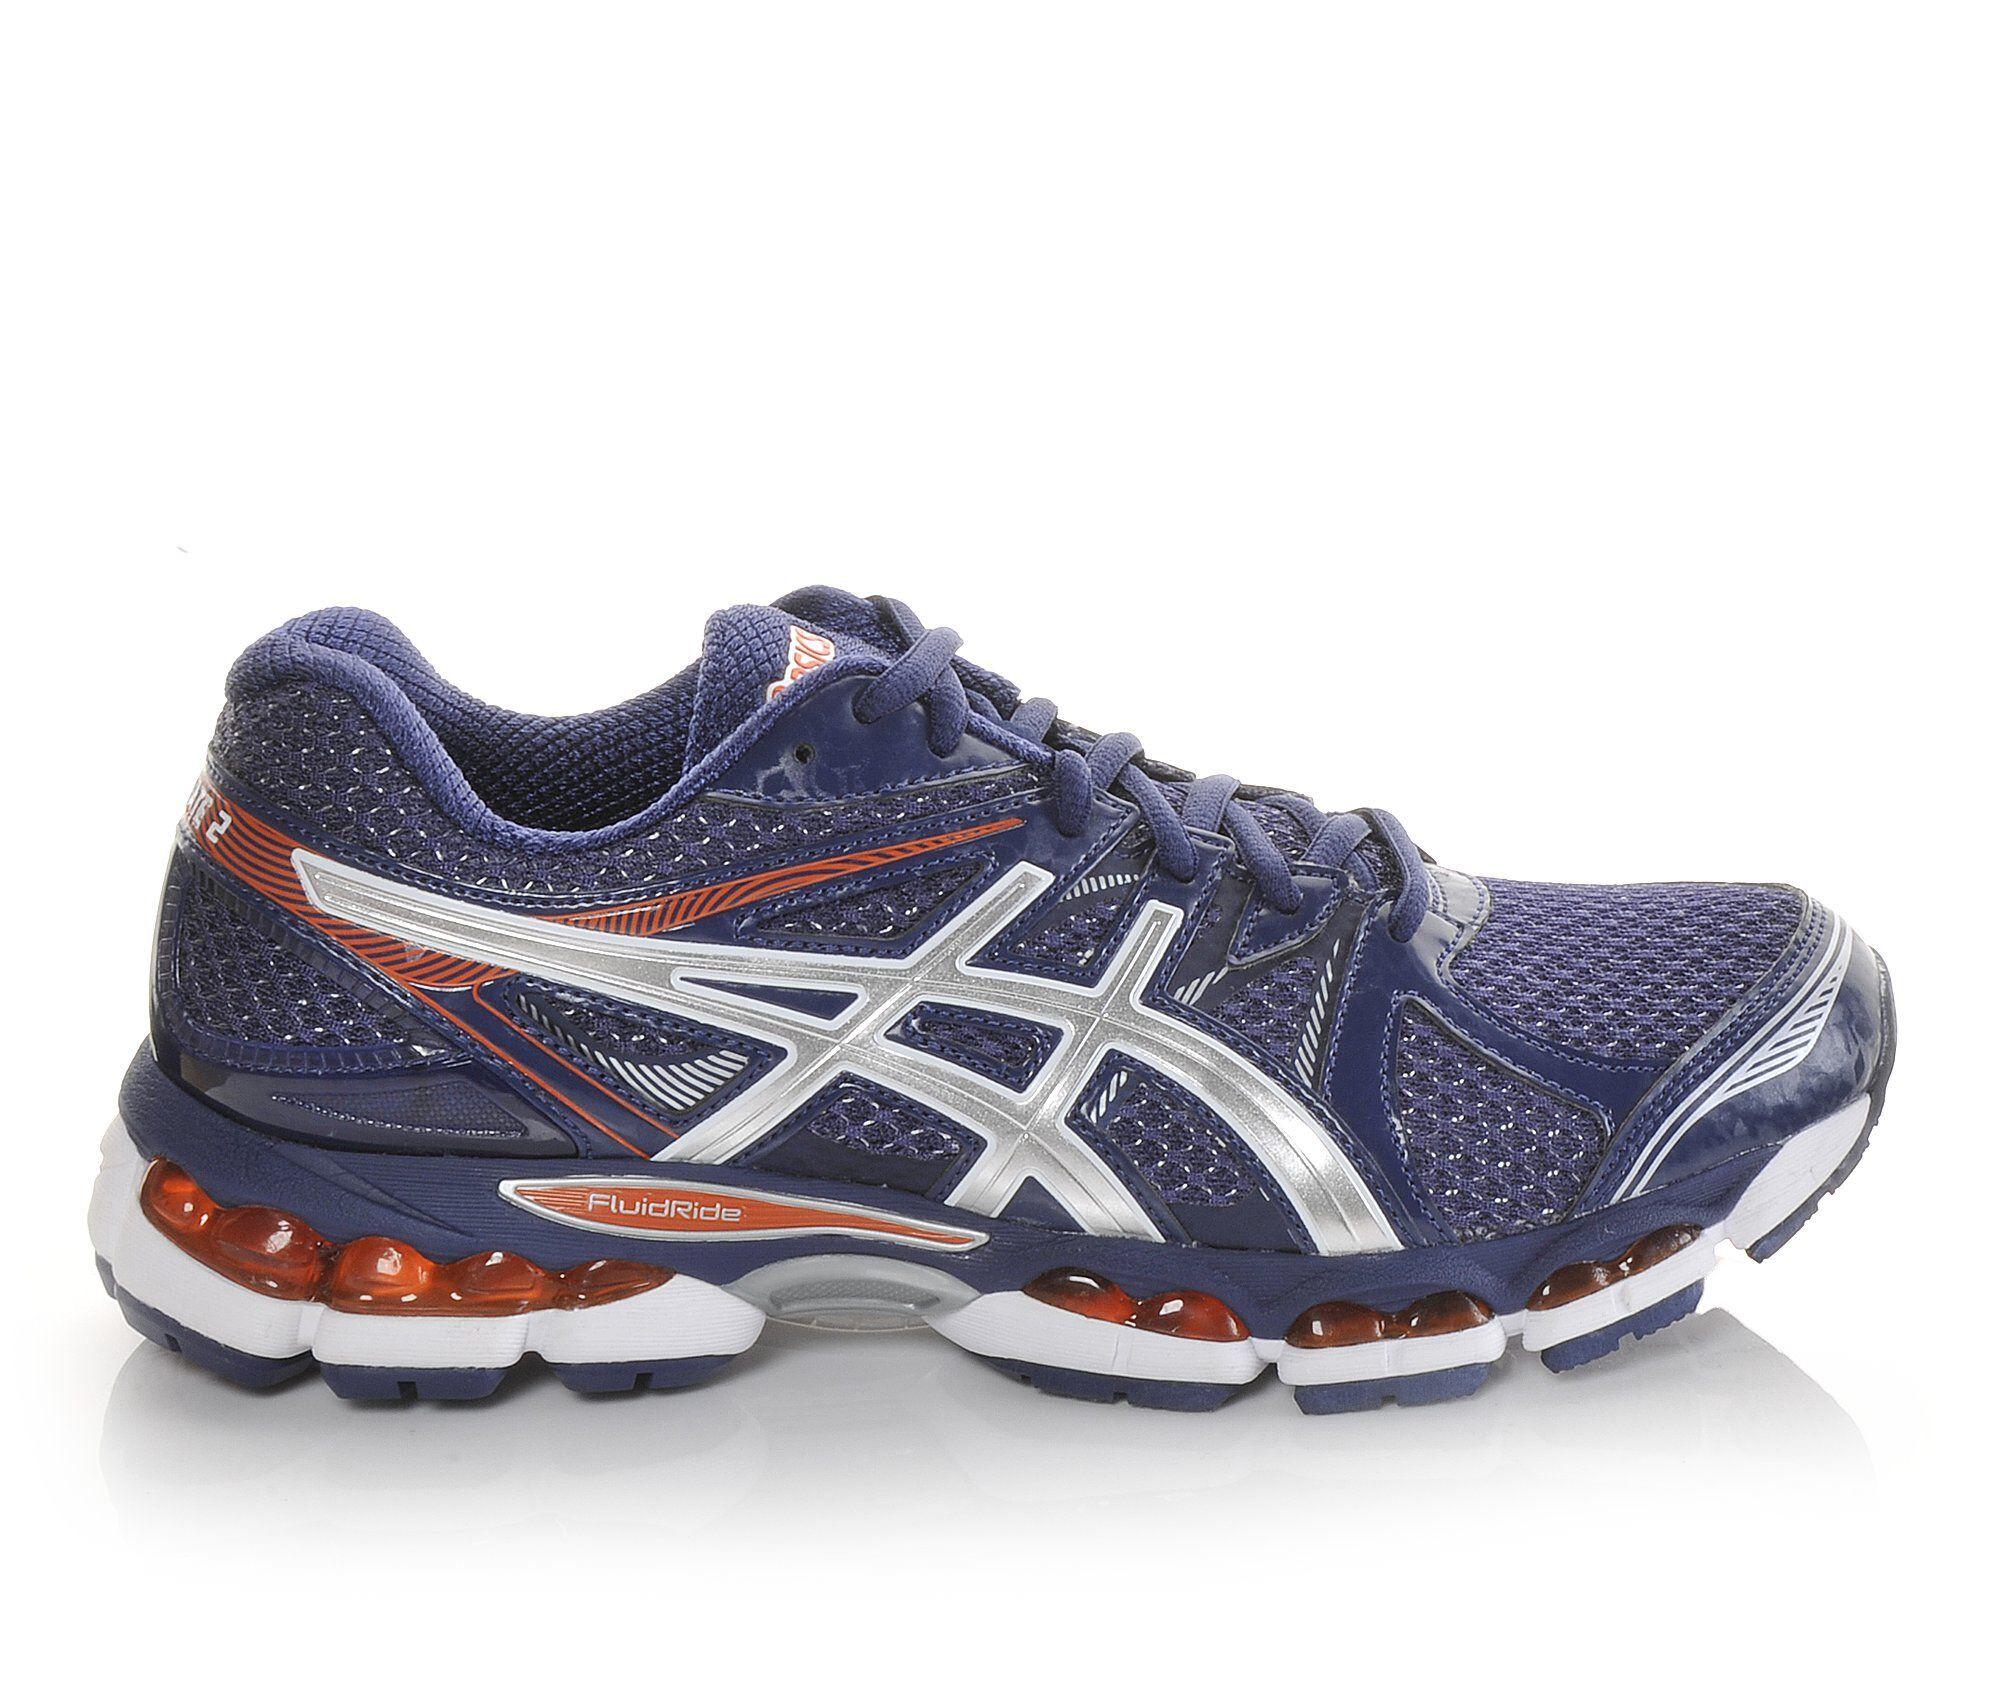 Images Mens Asics Gel Evate 2 Running Shoes